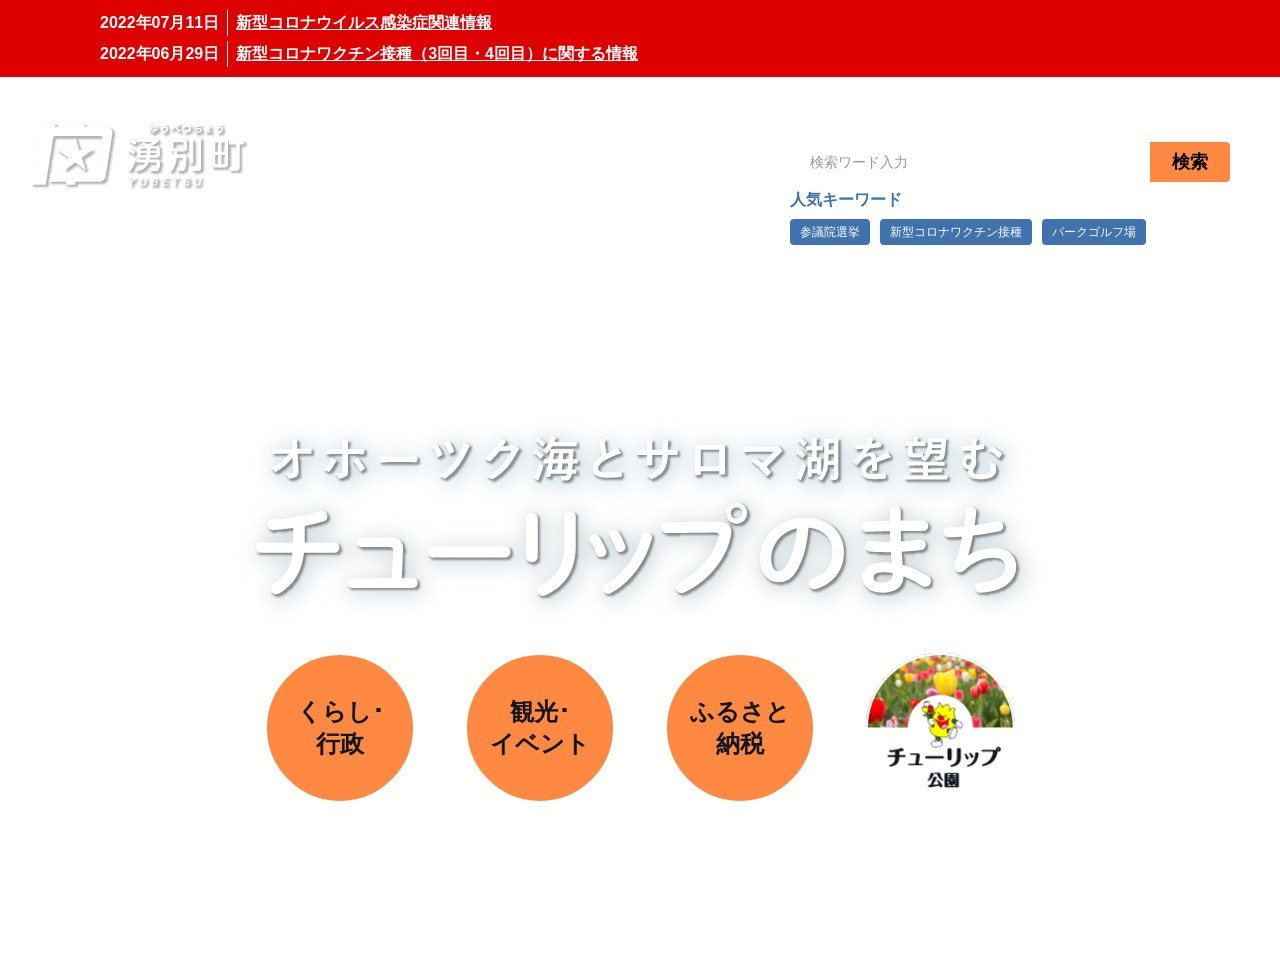 http://www.town.yubetsu.lg.jp/st/15machi/2015-0512-1636-6.html